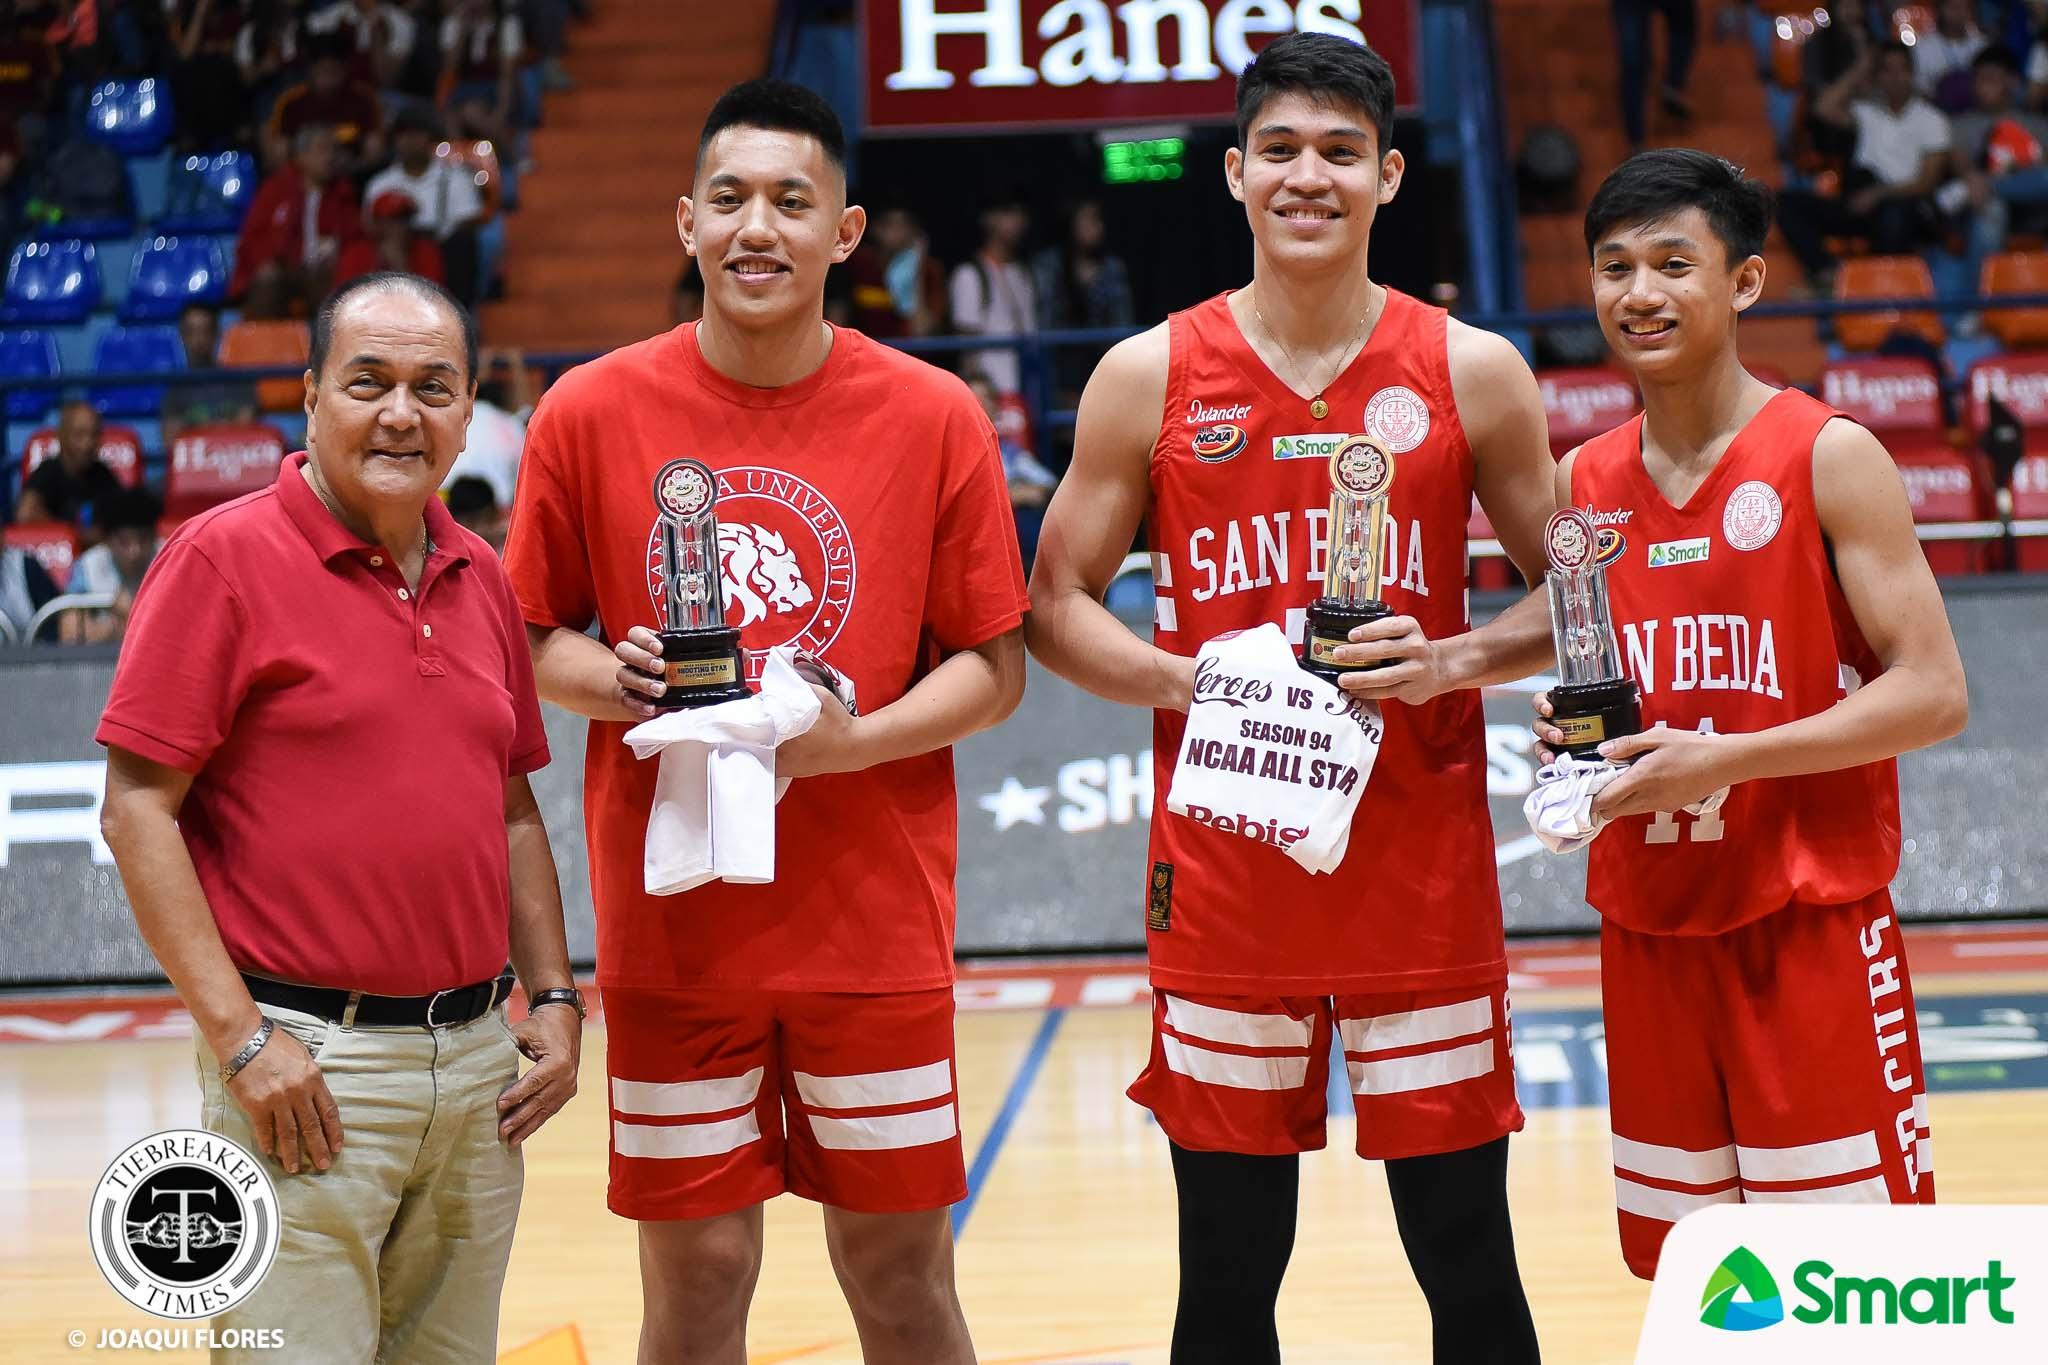 NCAA-94-Shooting-Stars-Oftana-Dela-Rosa-Estacio-3734 FEU-D standout Penny Estacio commits to La Salle Basketball DLSU FEU News UAAP  - philippine sports news